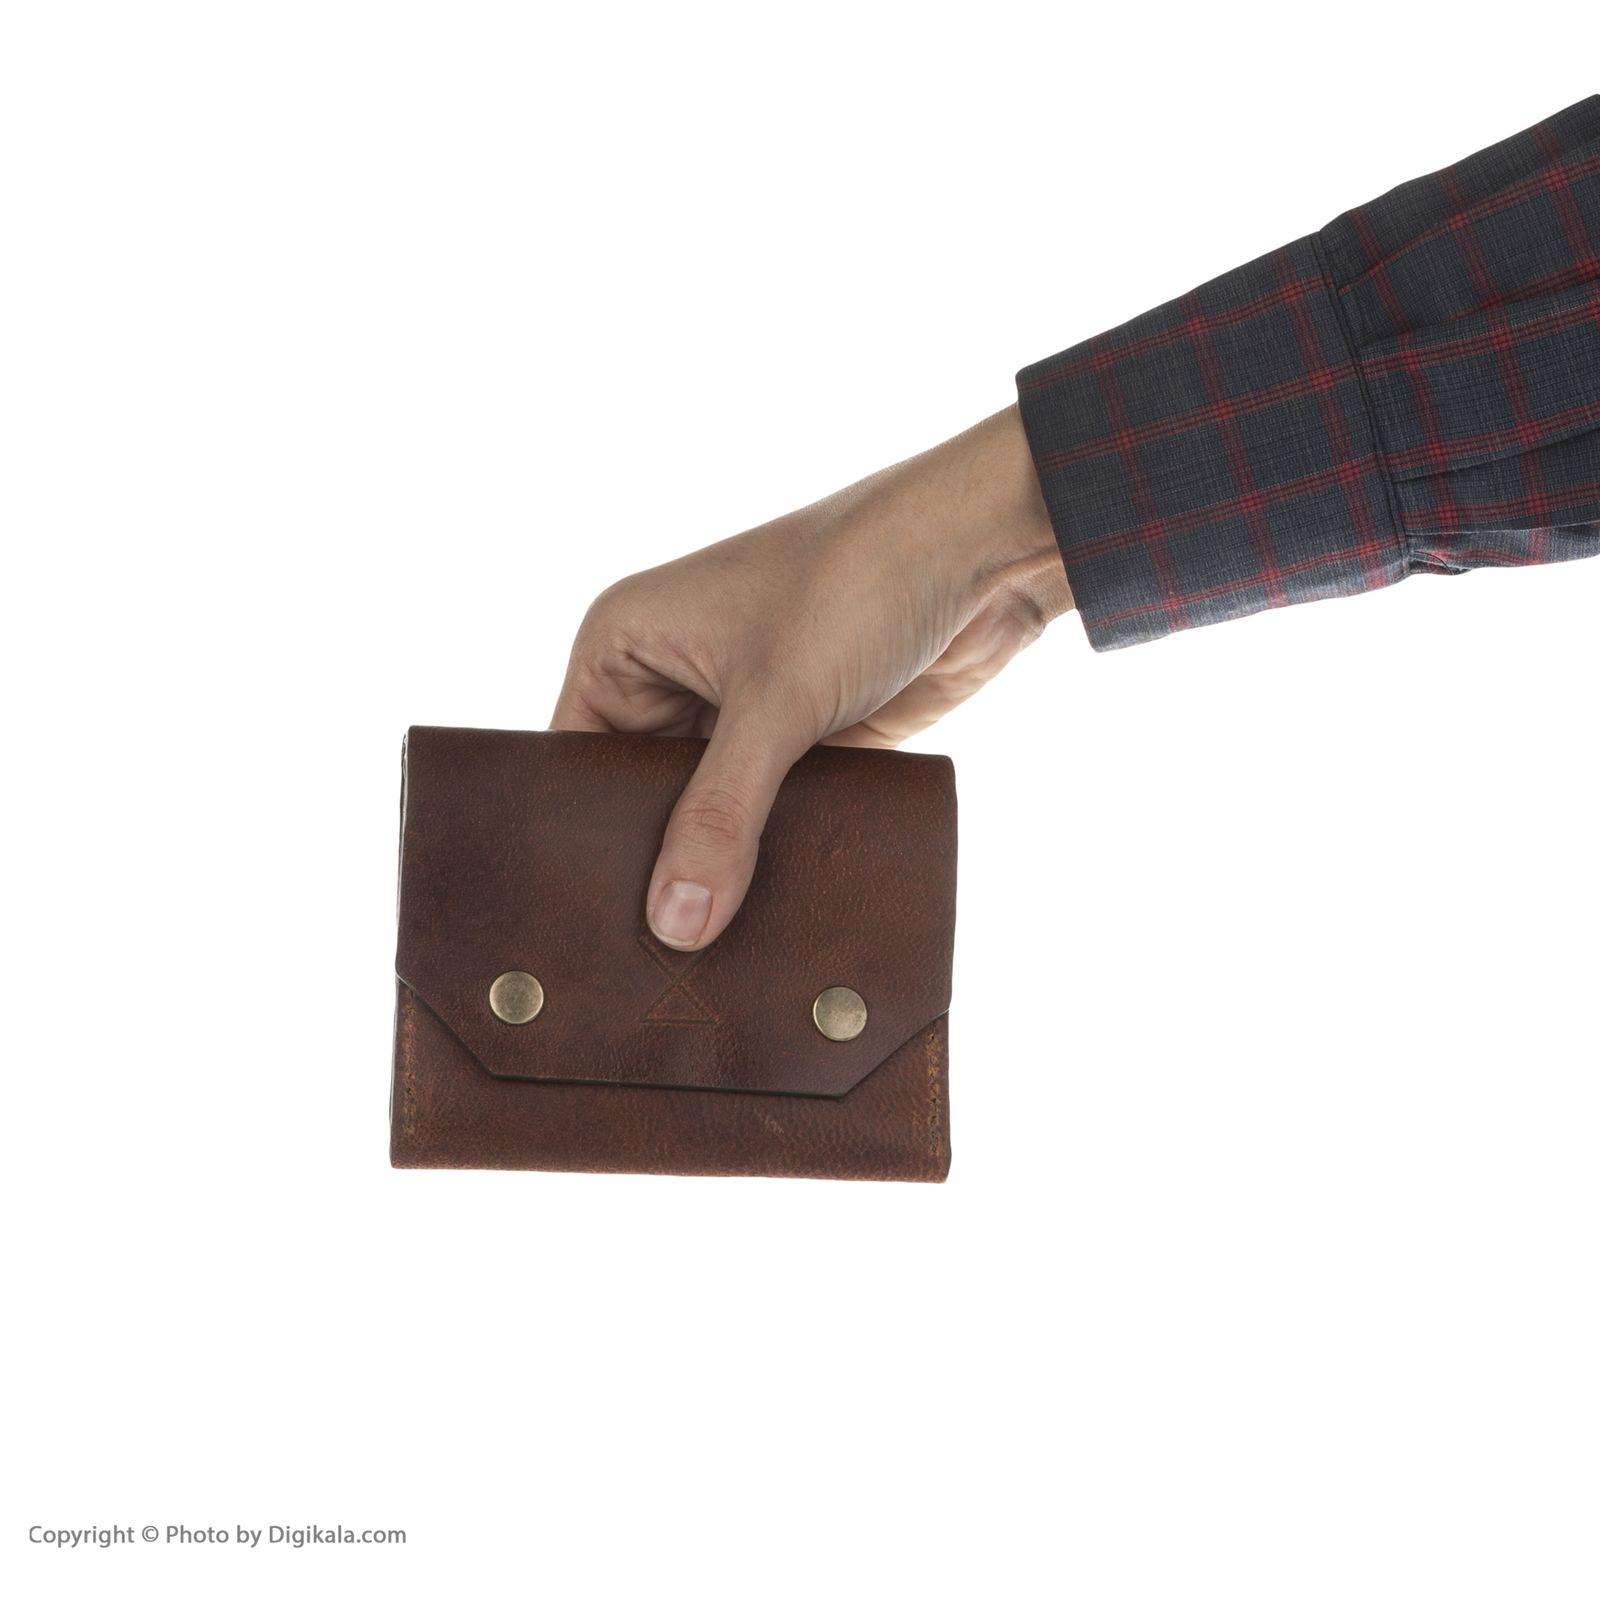 کیف پول مردانه چرم لانکا مدل PC-9-04 main 1 4